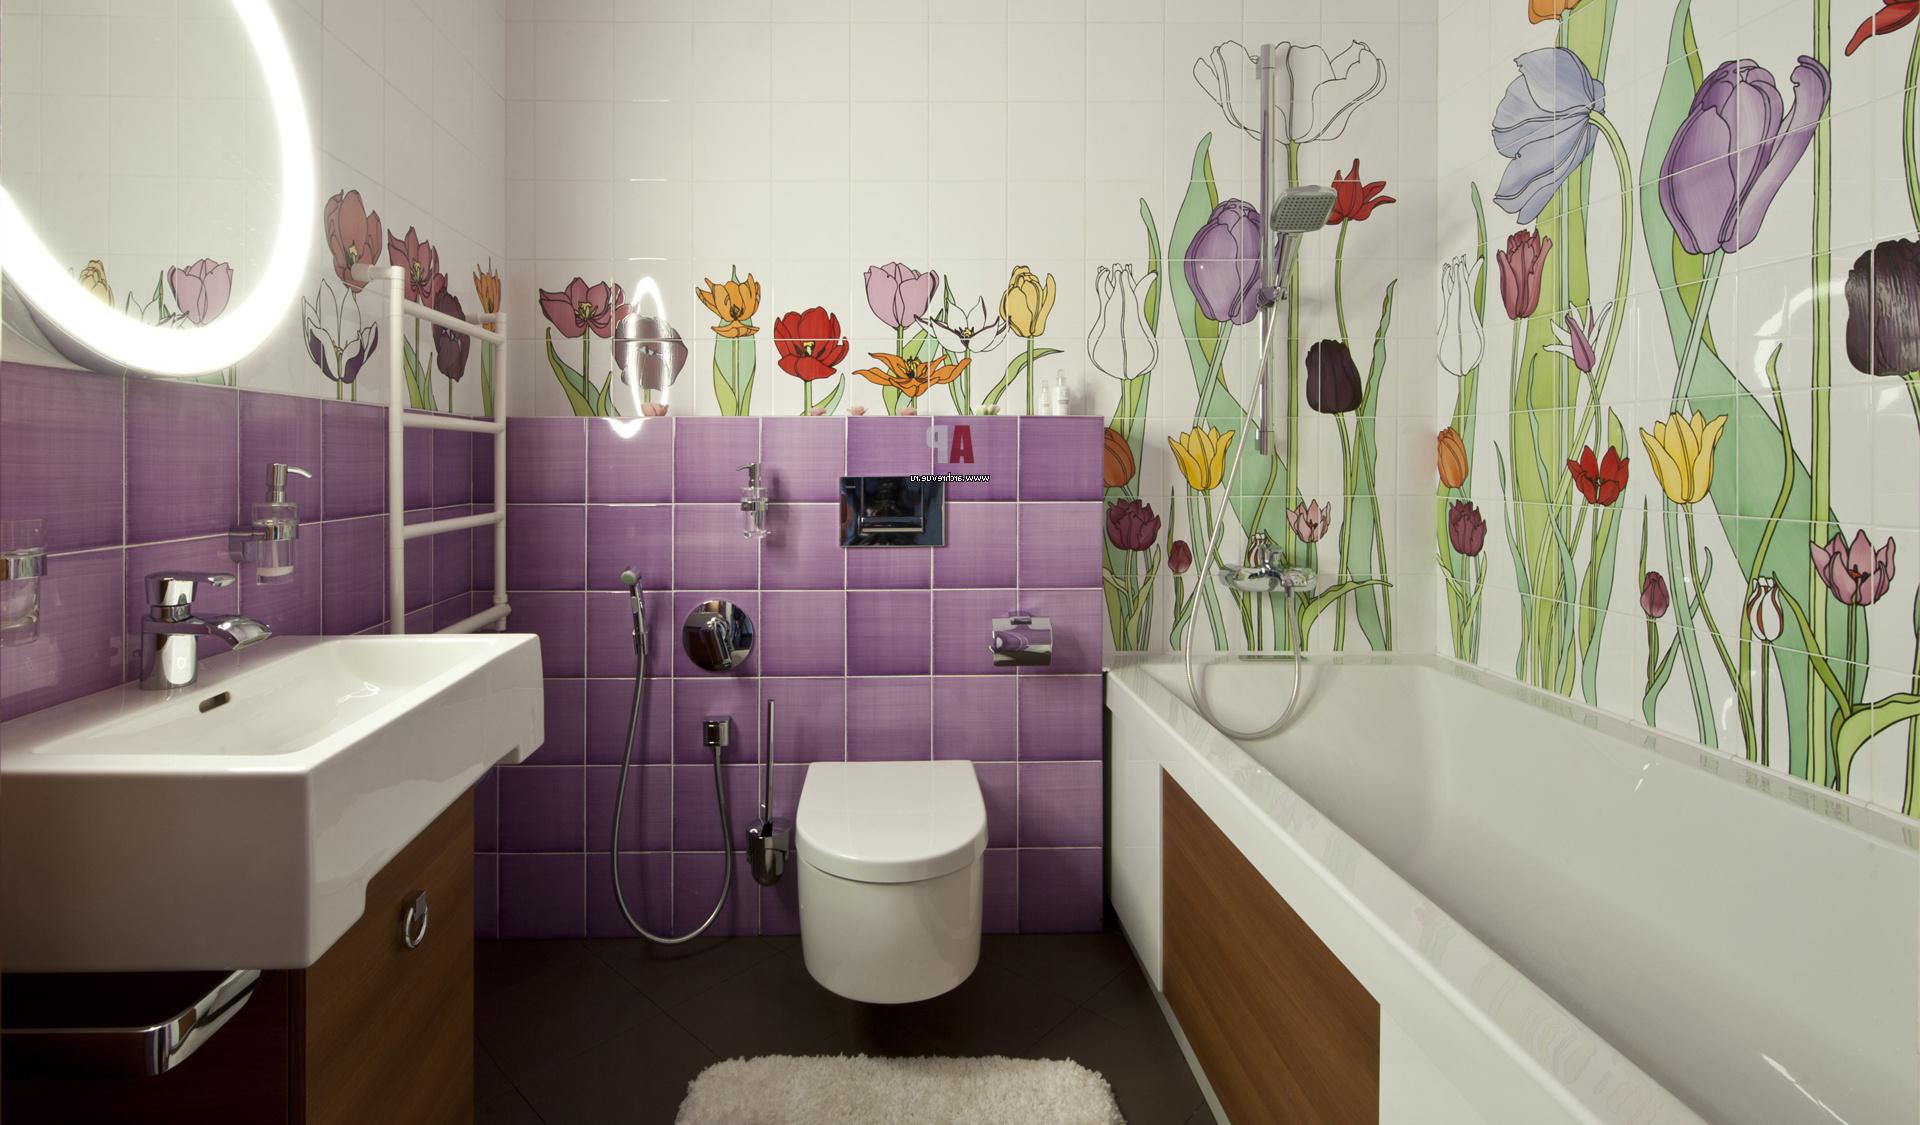 dizajn malenkoj vannoj komnaty 1 - Идеи и советы для ремонта в ванной комнате